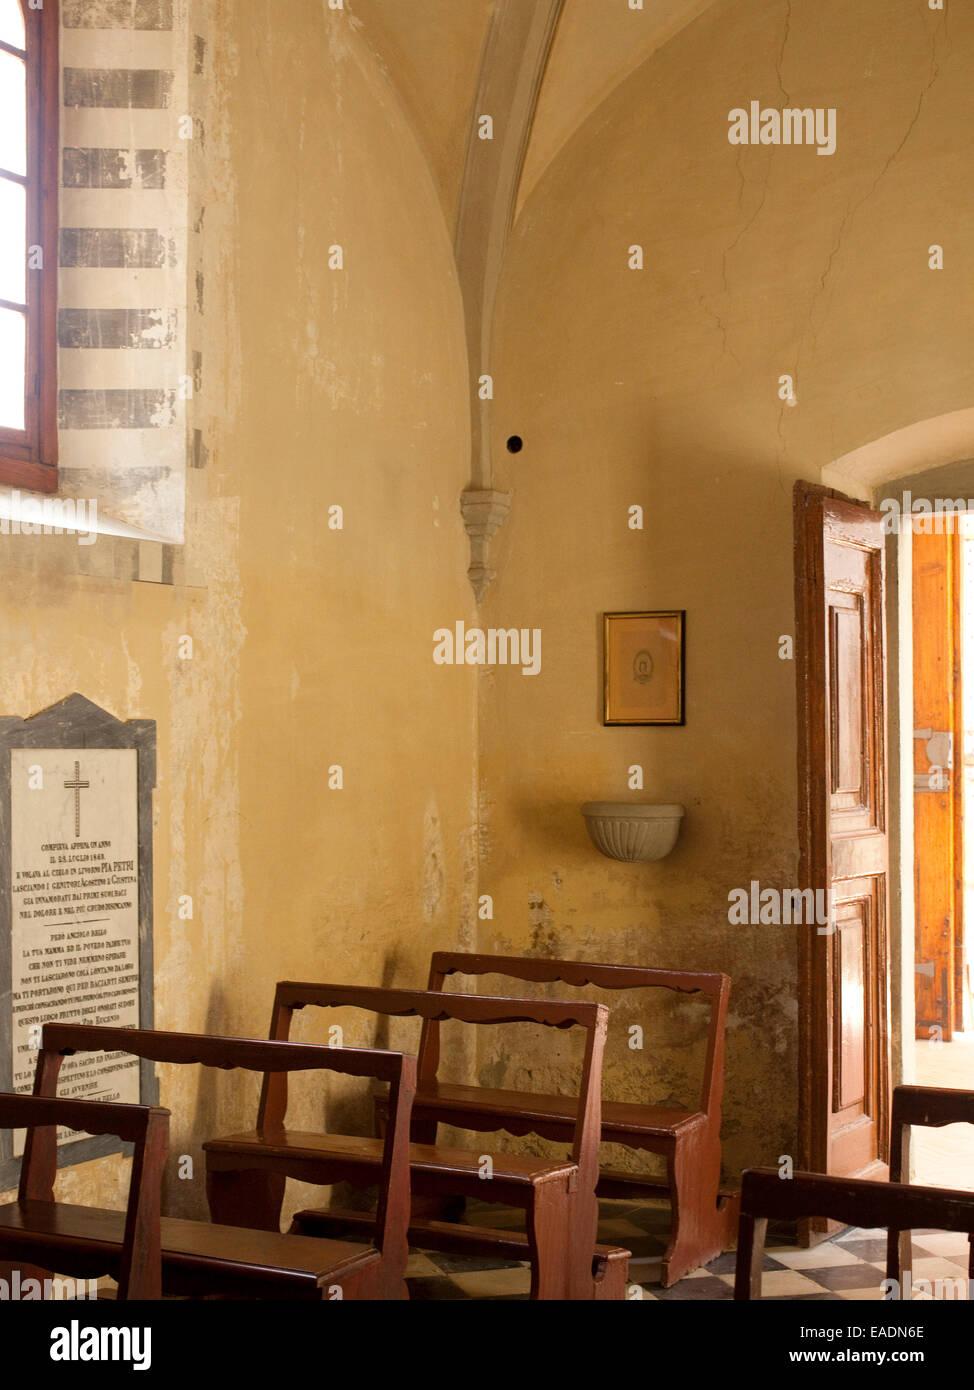 pews in small Italian church Stock Photo